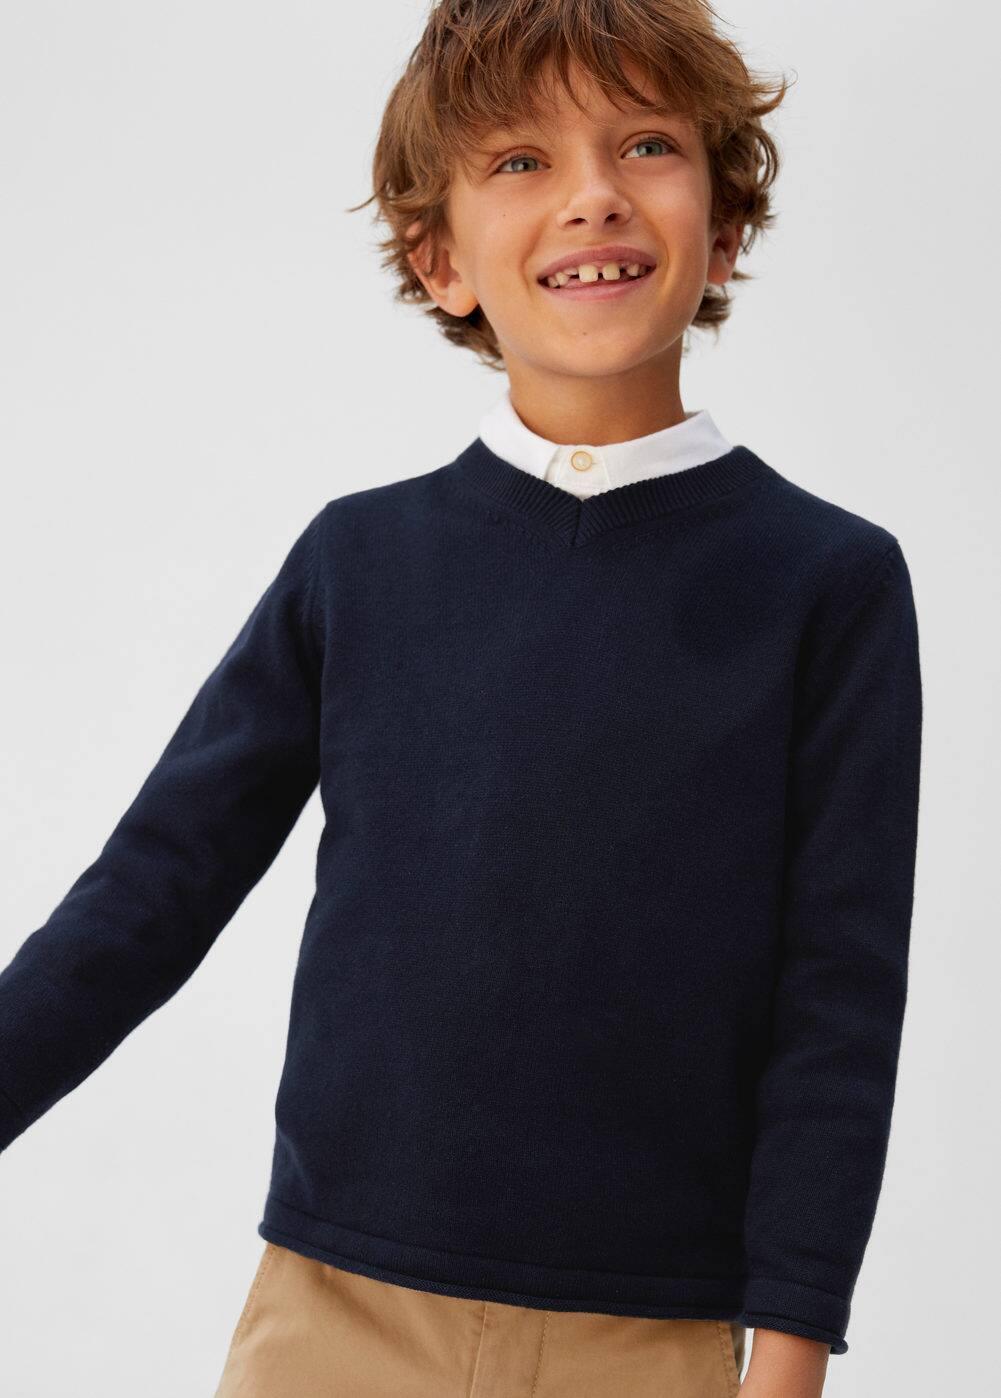 o-fede5:jersey basico algodon